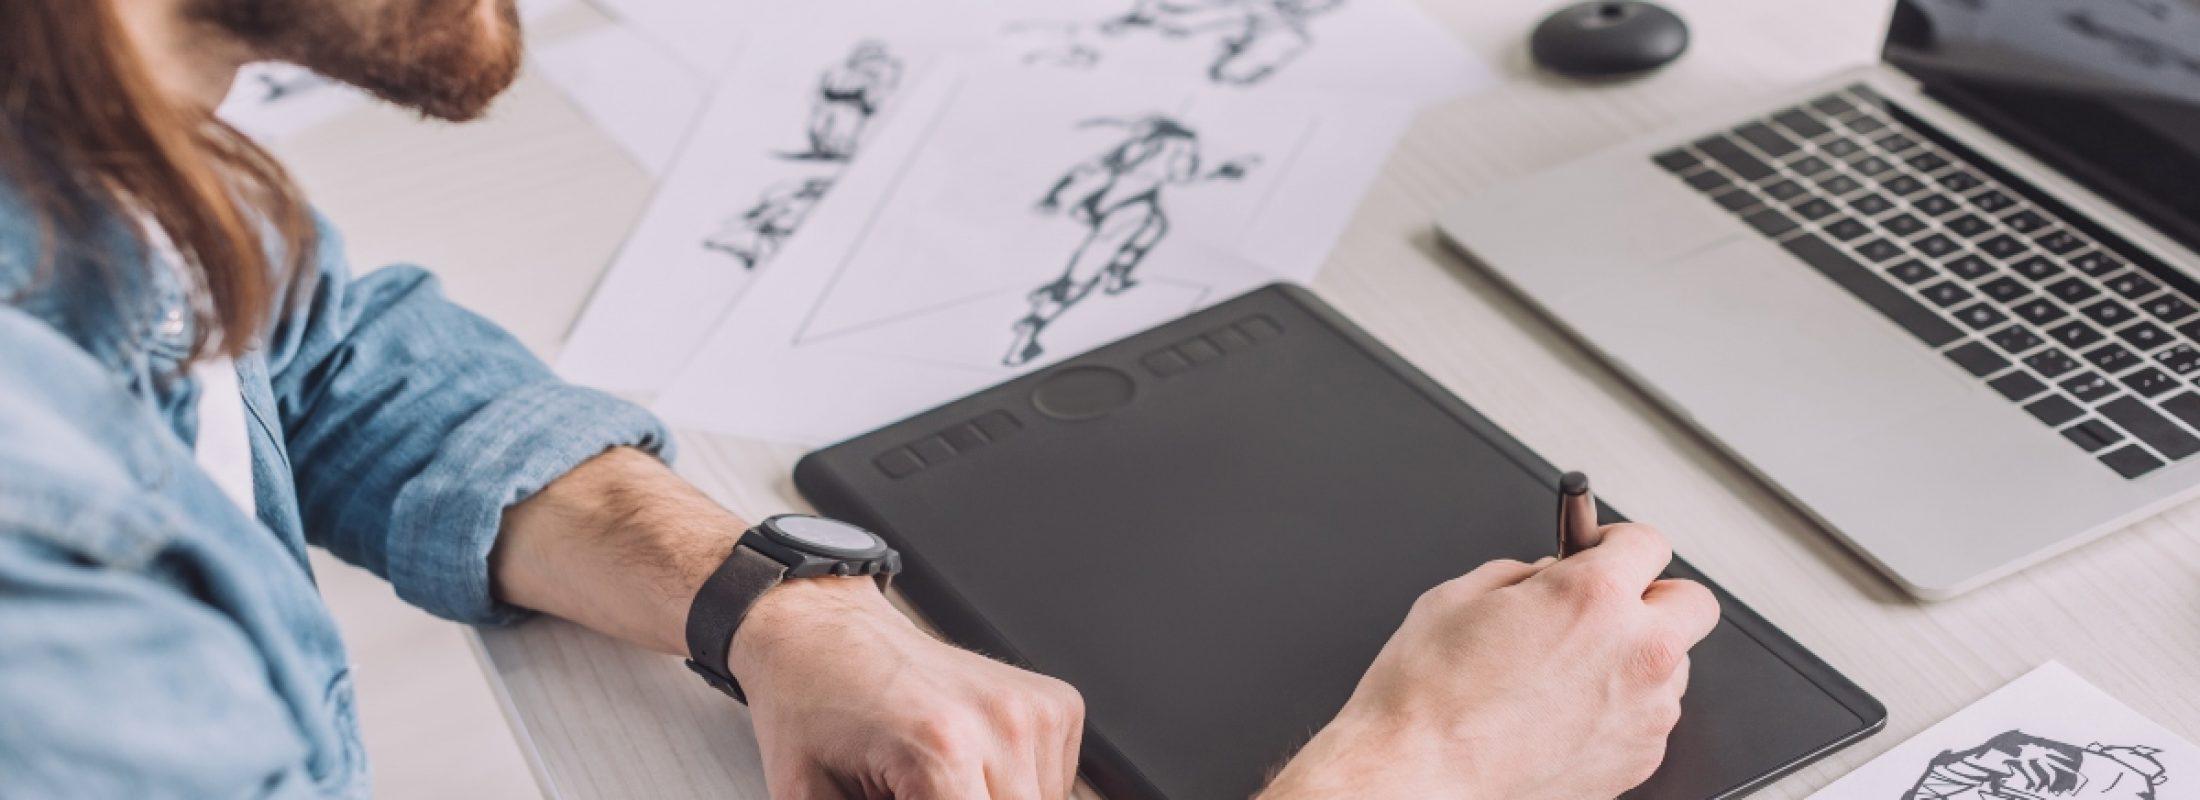 cropped view of animator in headphones using digital tablet